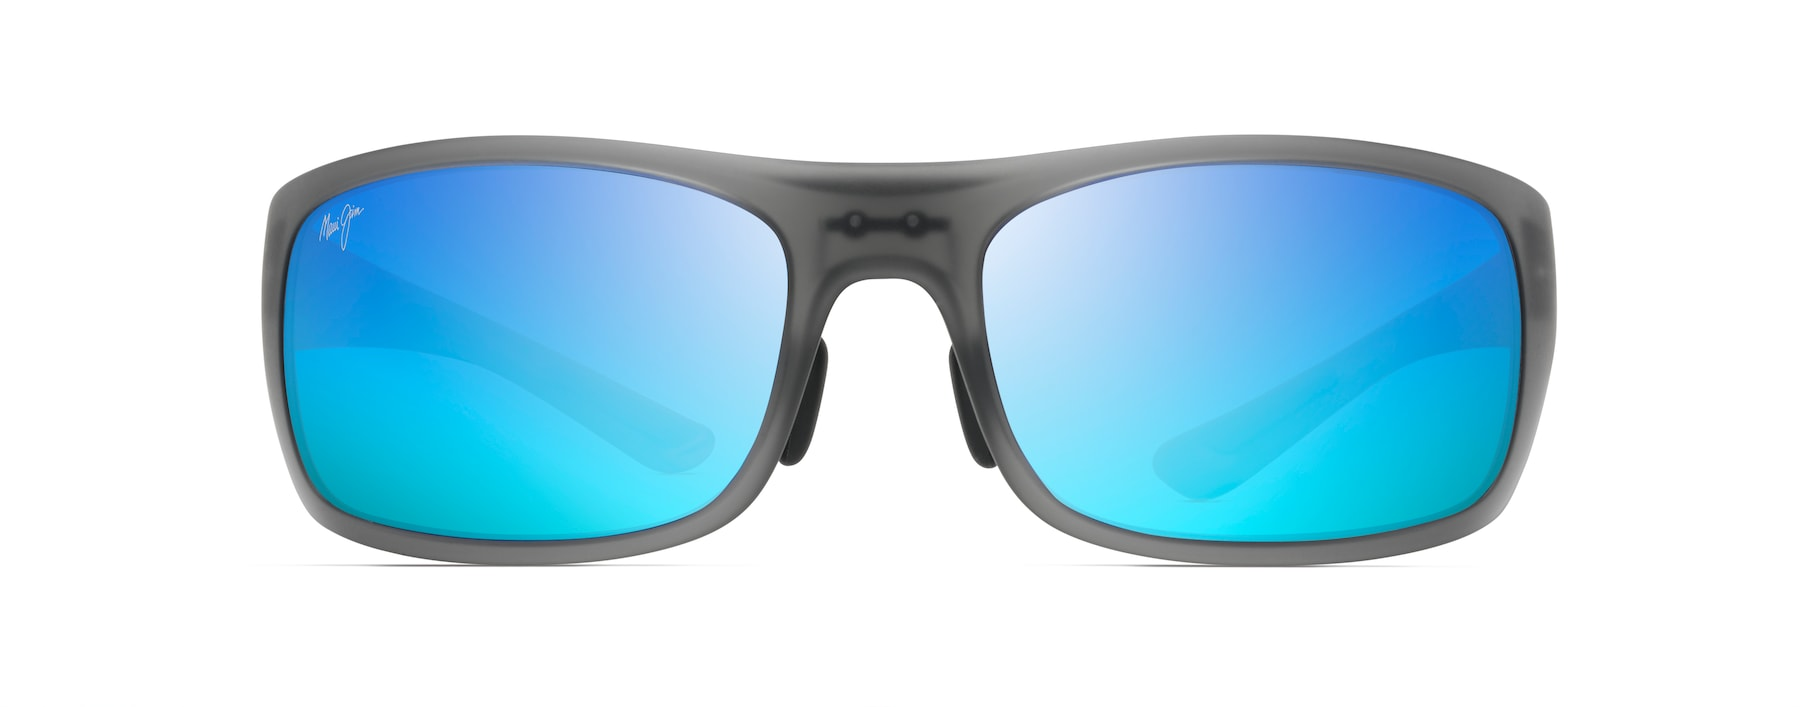 6524afa0aa9 Big Wave Polarised Sunglasses